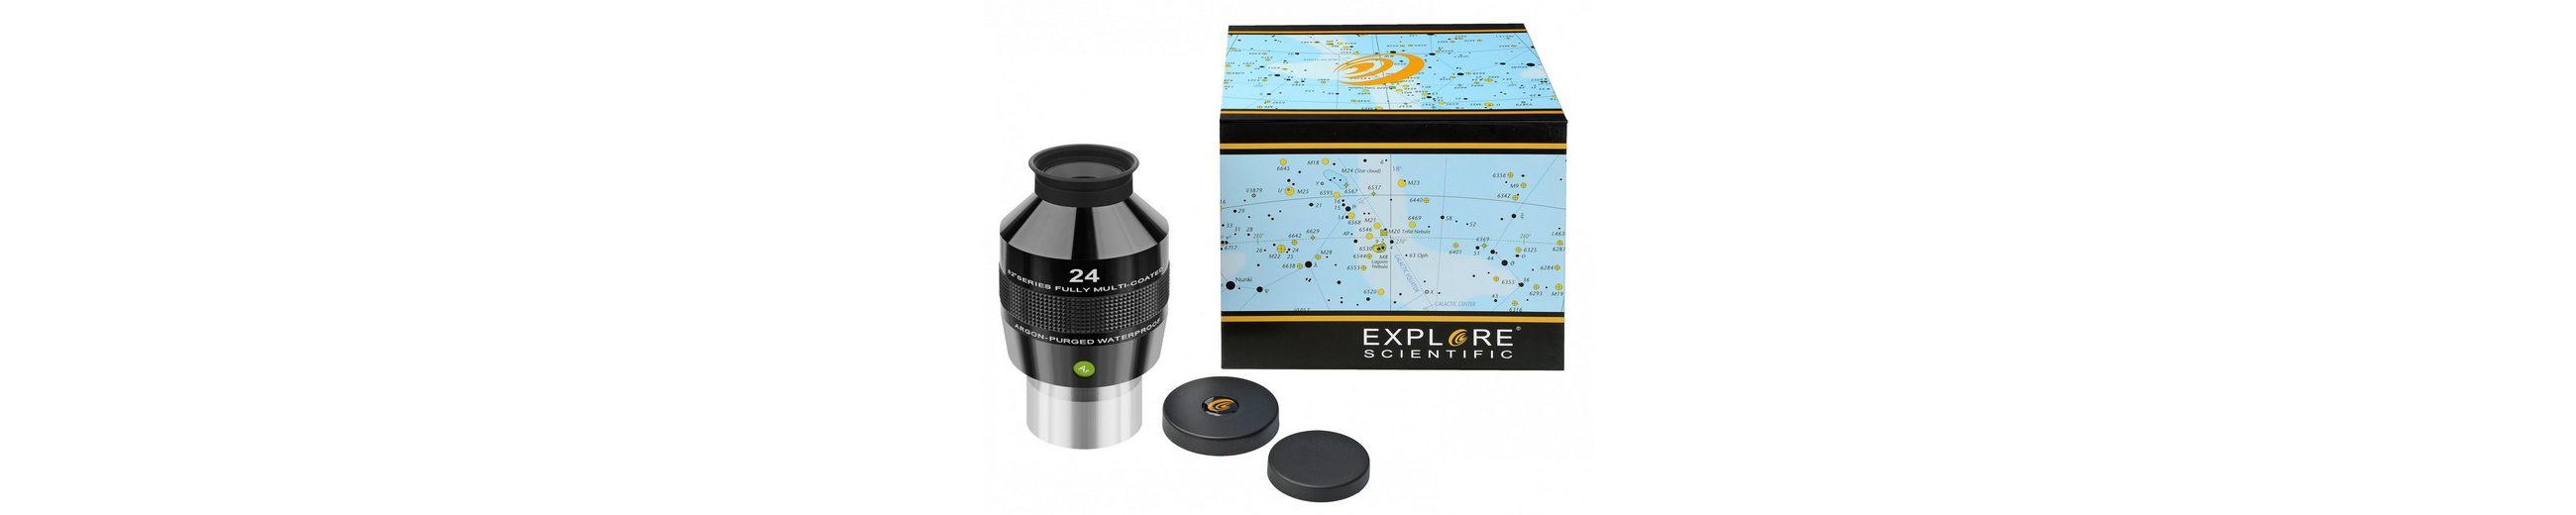 "Bresser Teleskop »EXPLORE SCIENTIFIC 82° N2 Okular 24mm (2"")«"